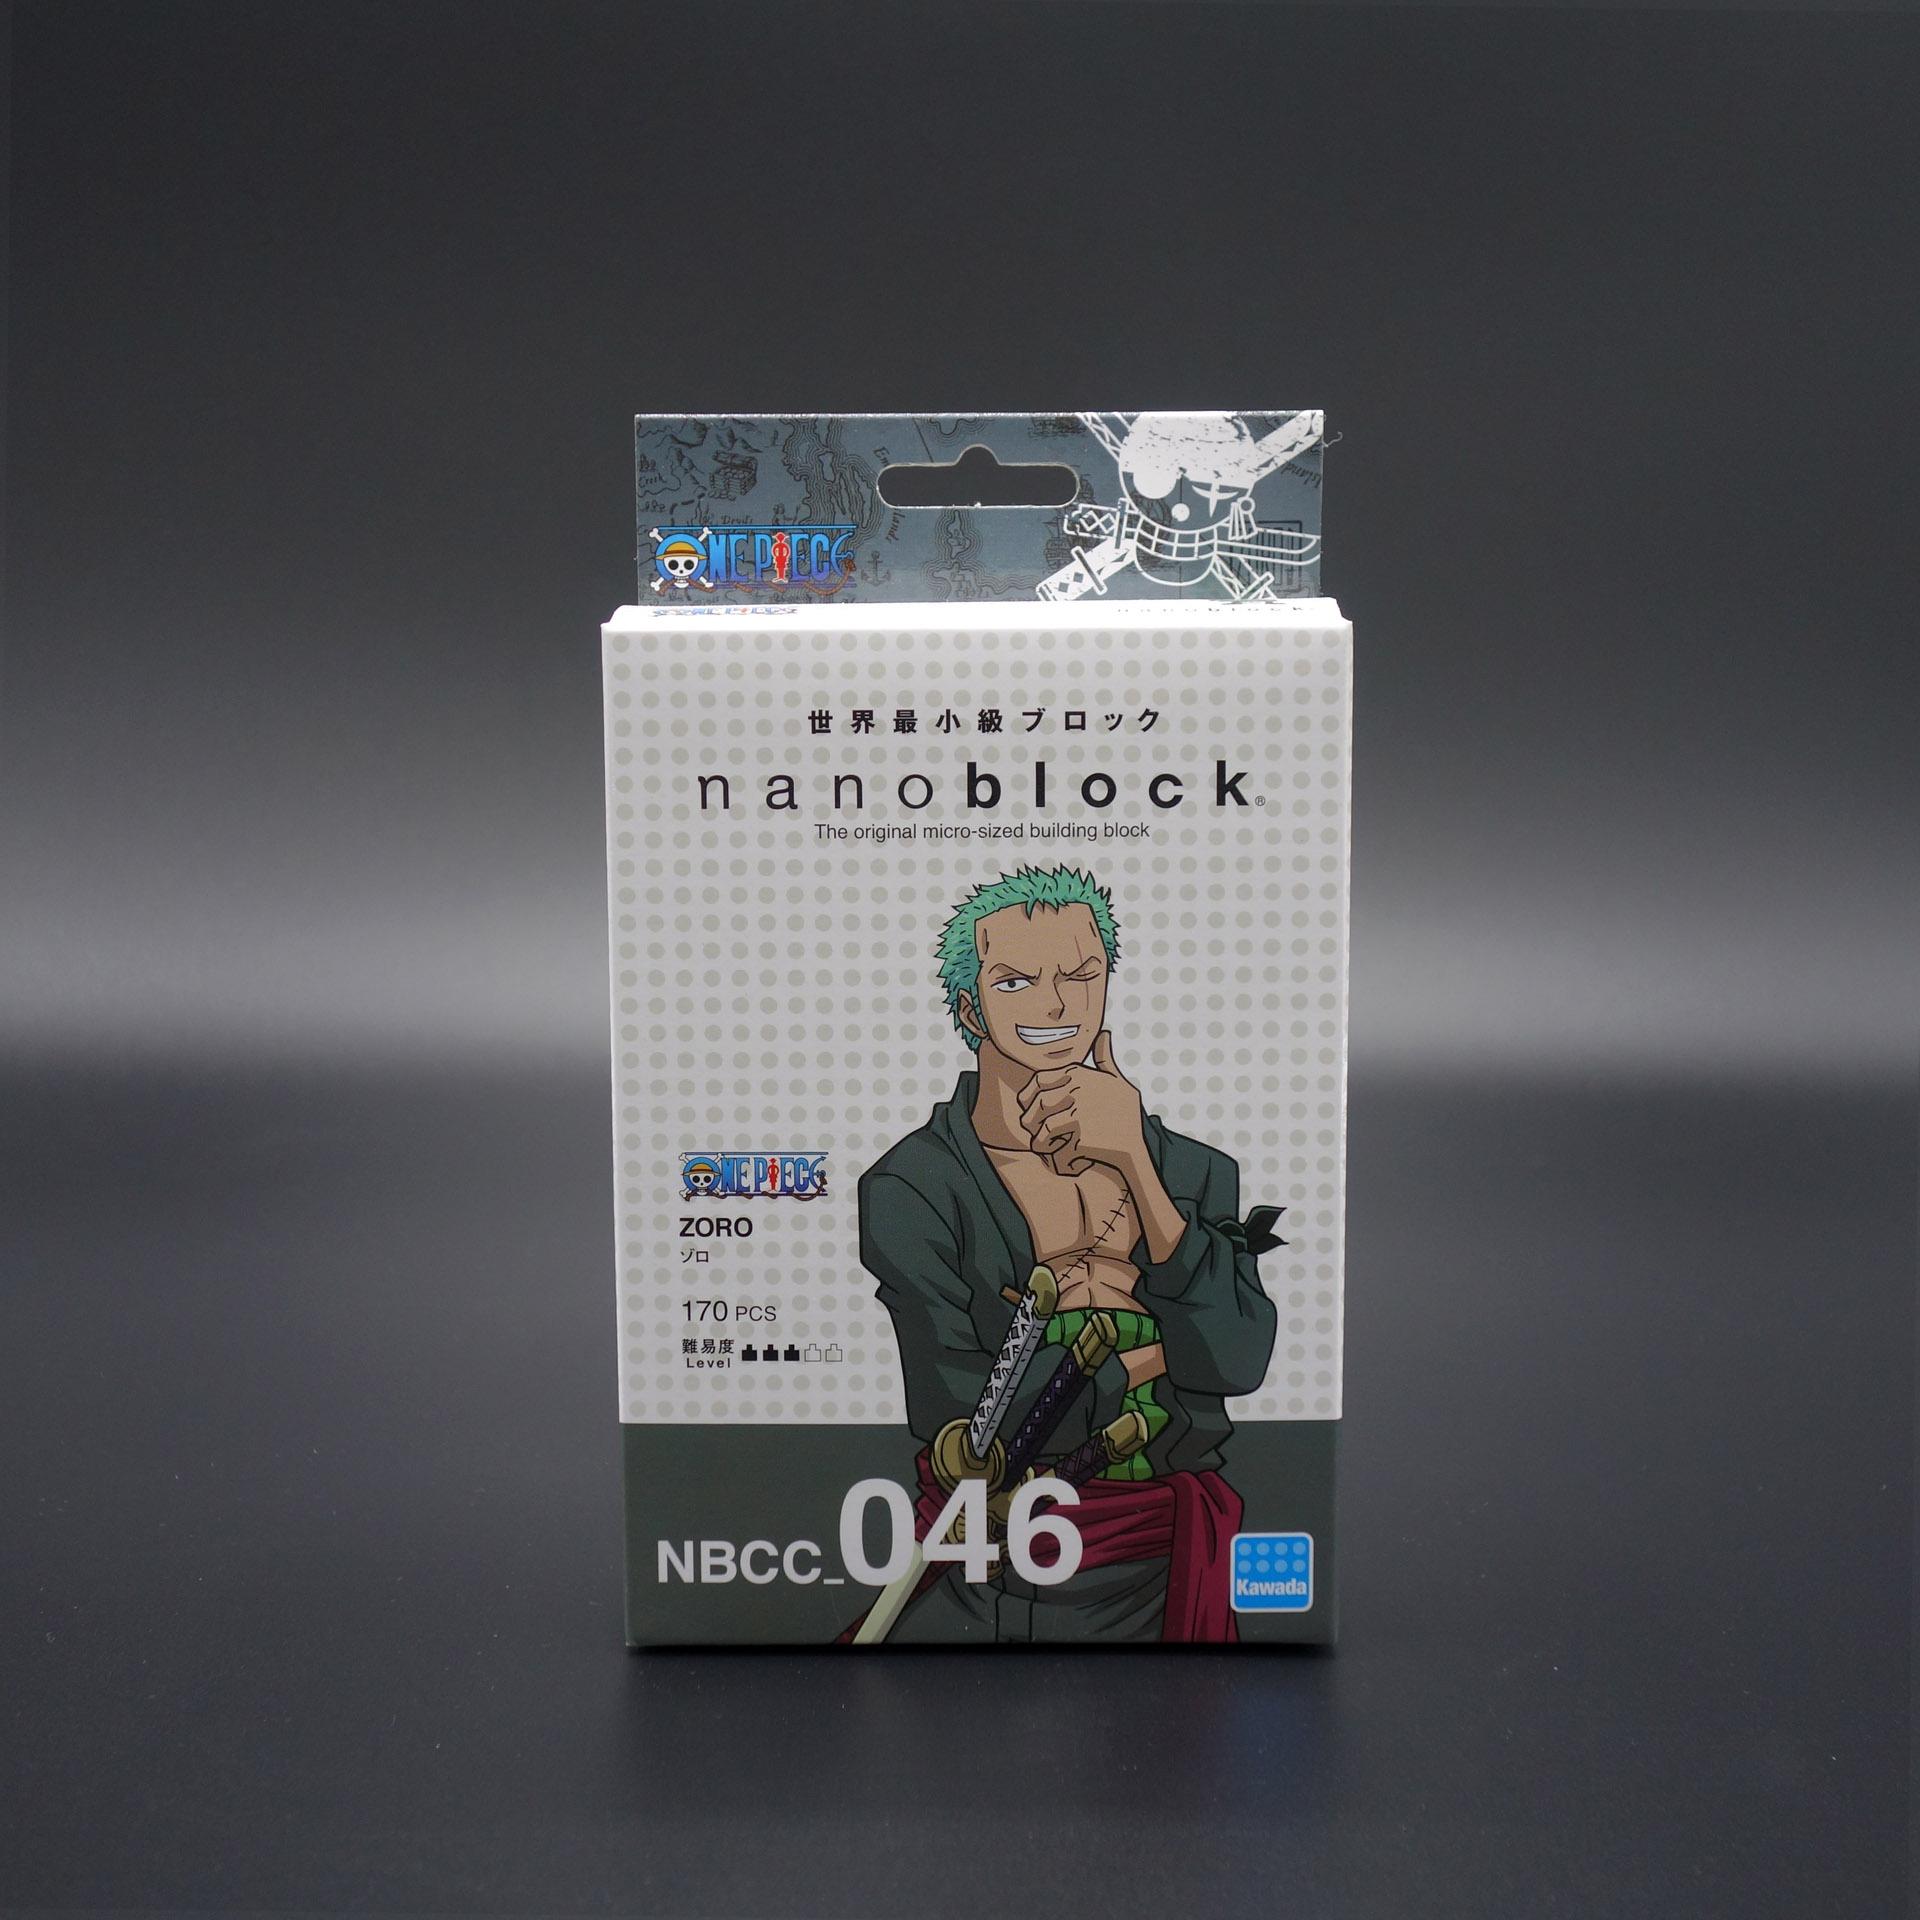 nanoblock One Piece Zoro